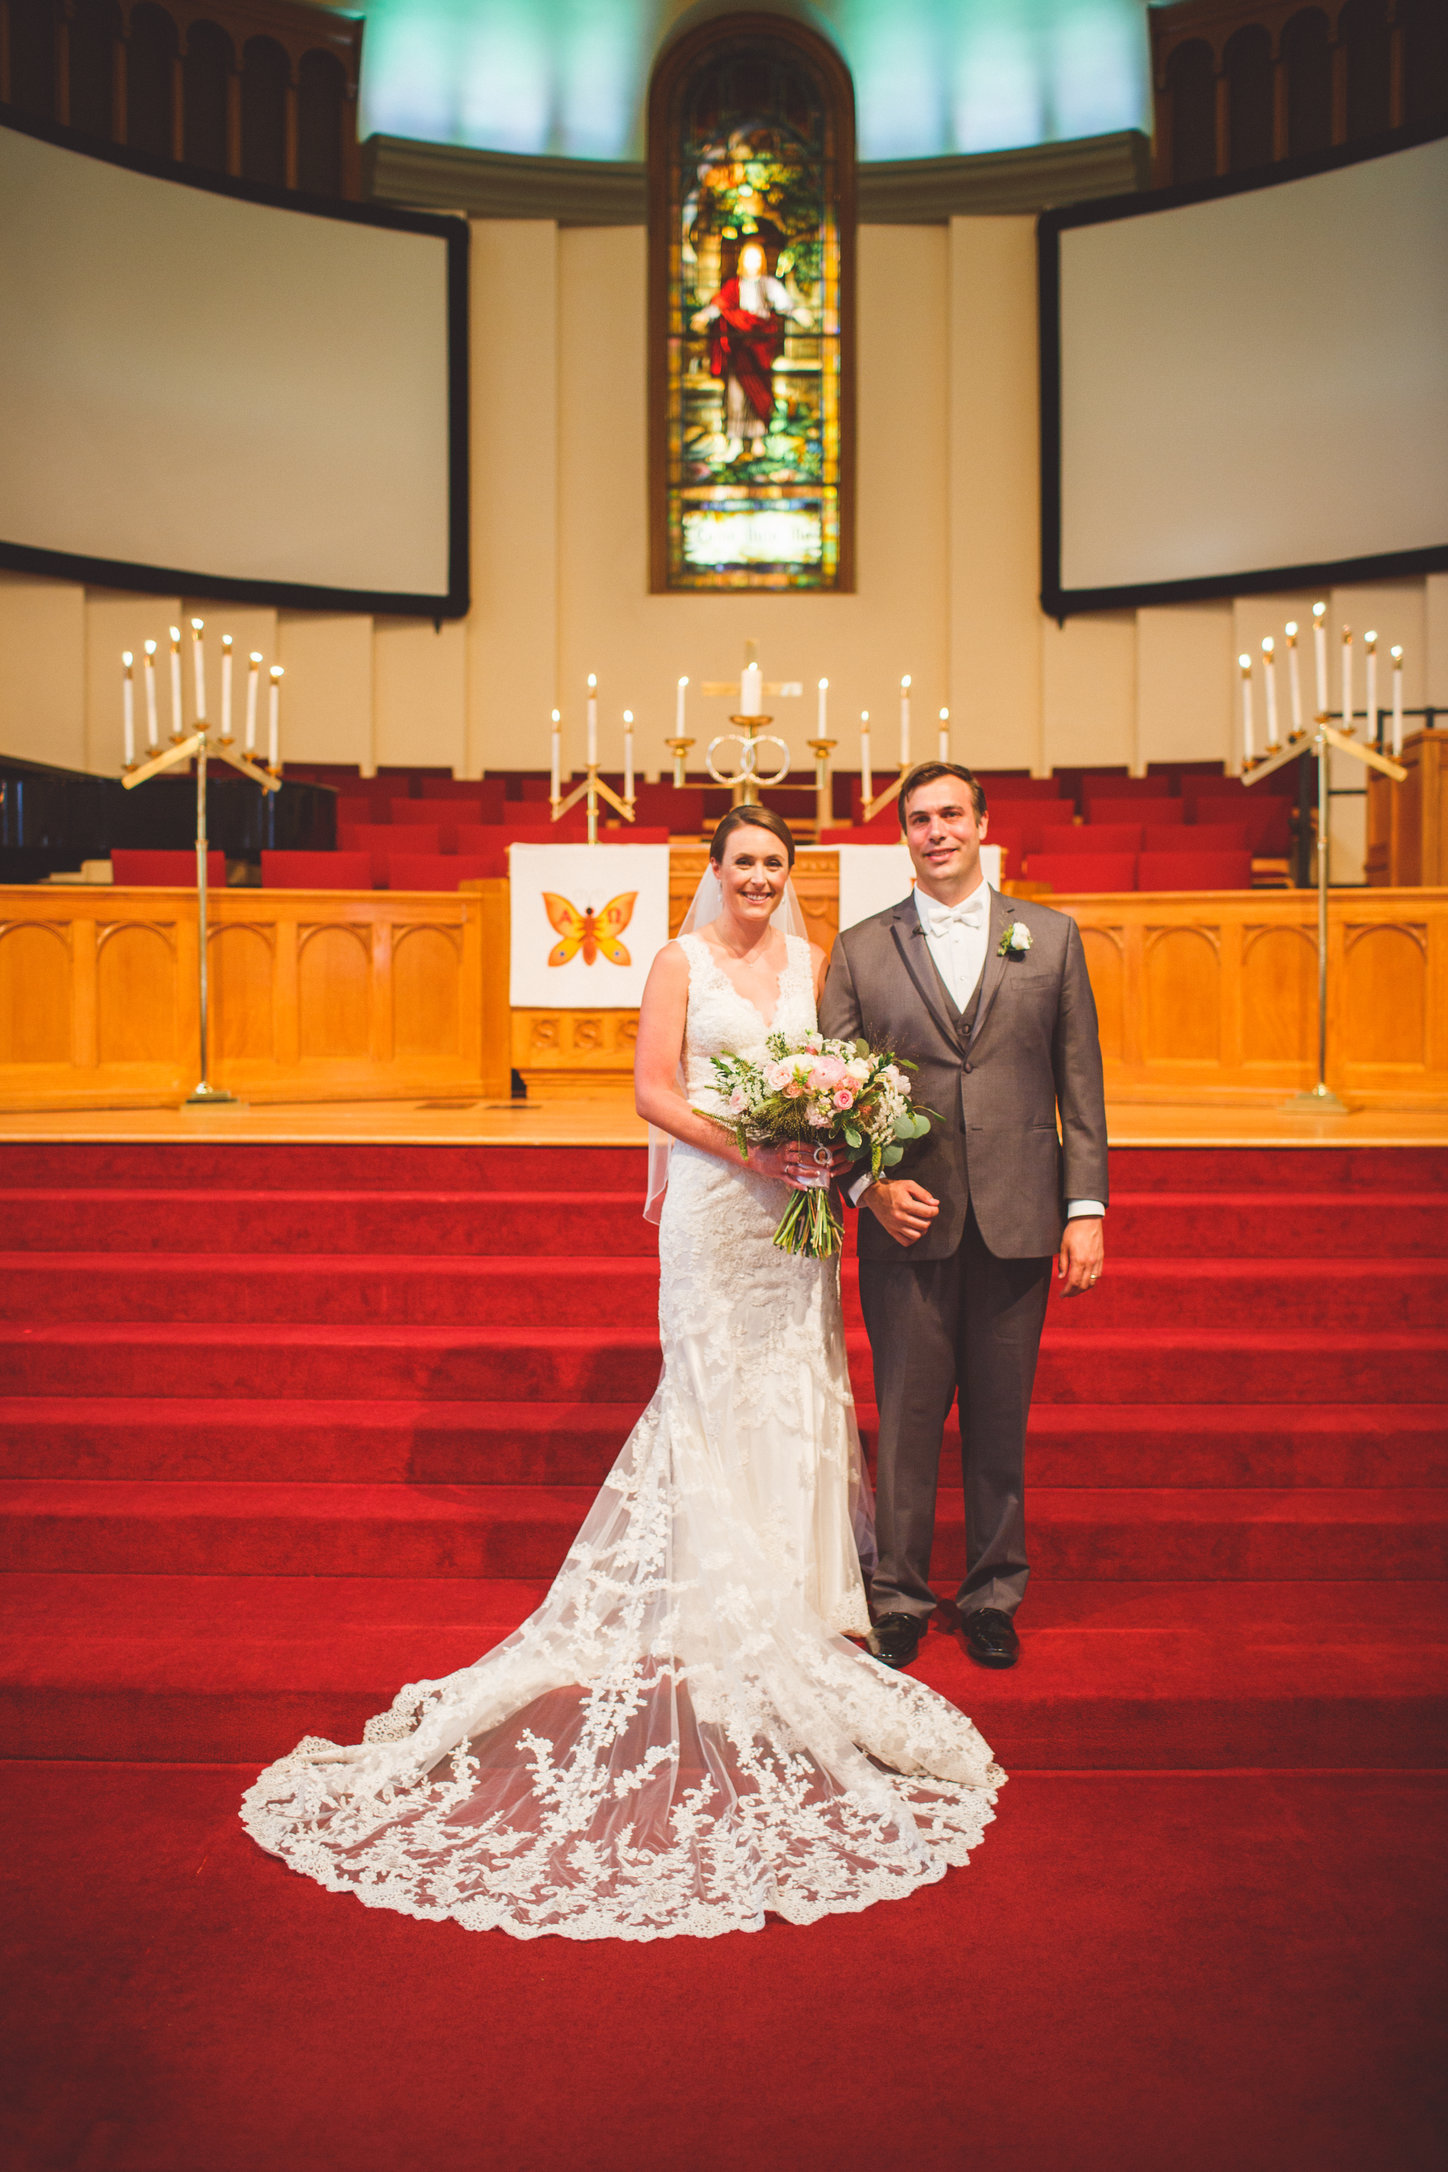 SandC-wedding-246.jpg